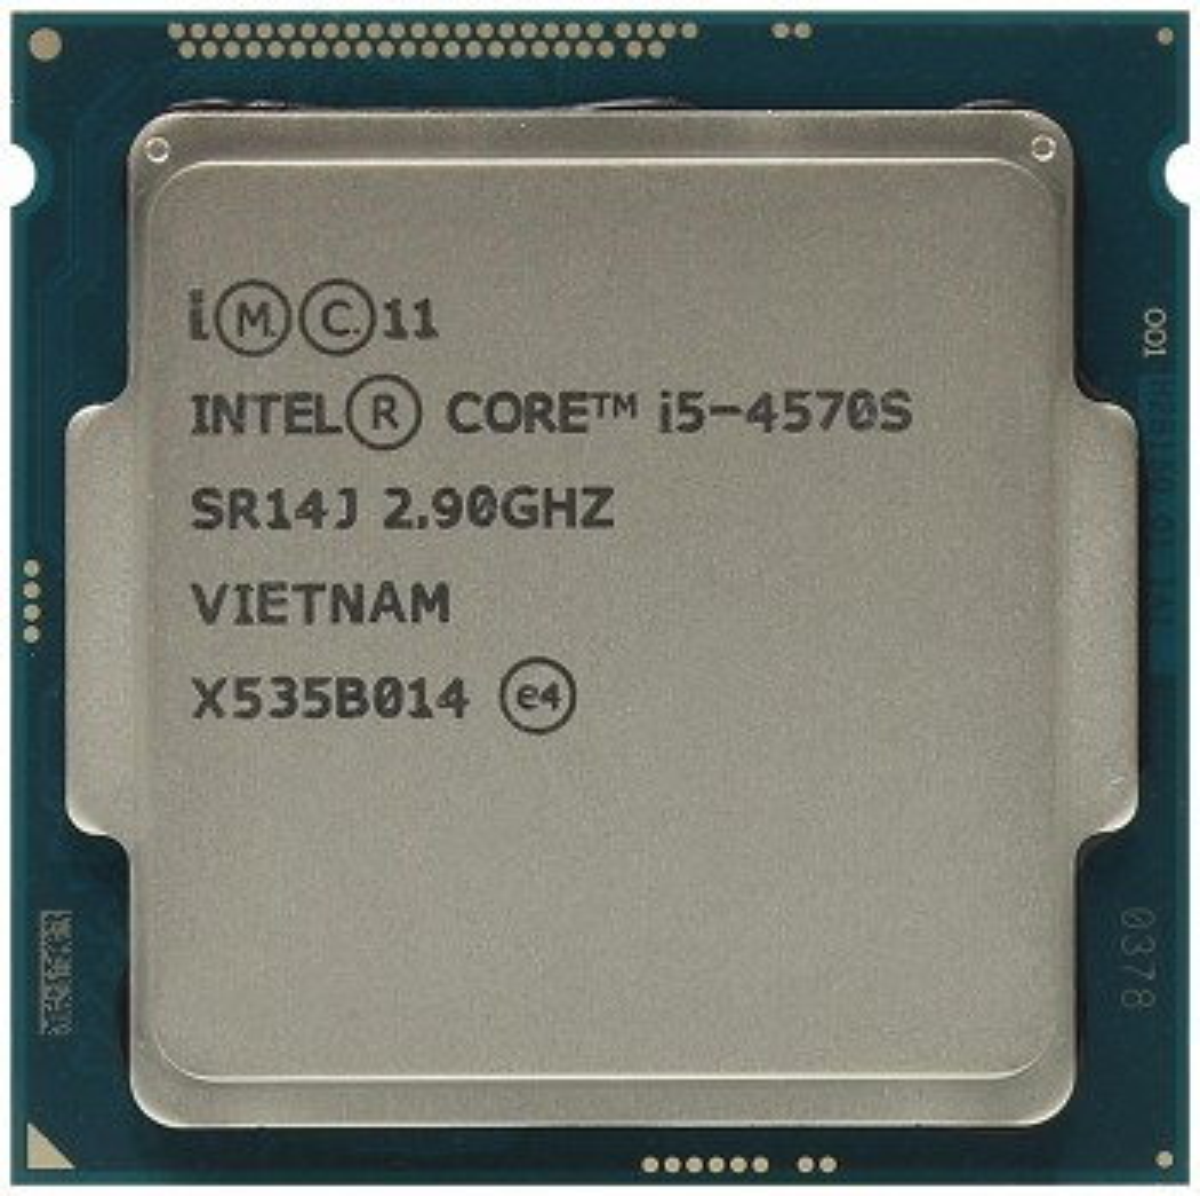 INTEL CORE I5 4570S (6 MB ქეშ მეხსიერება, 2.9 GHZ) TRAY